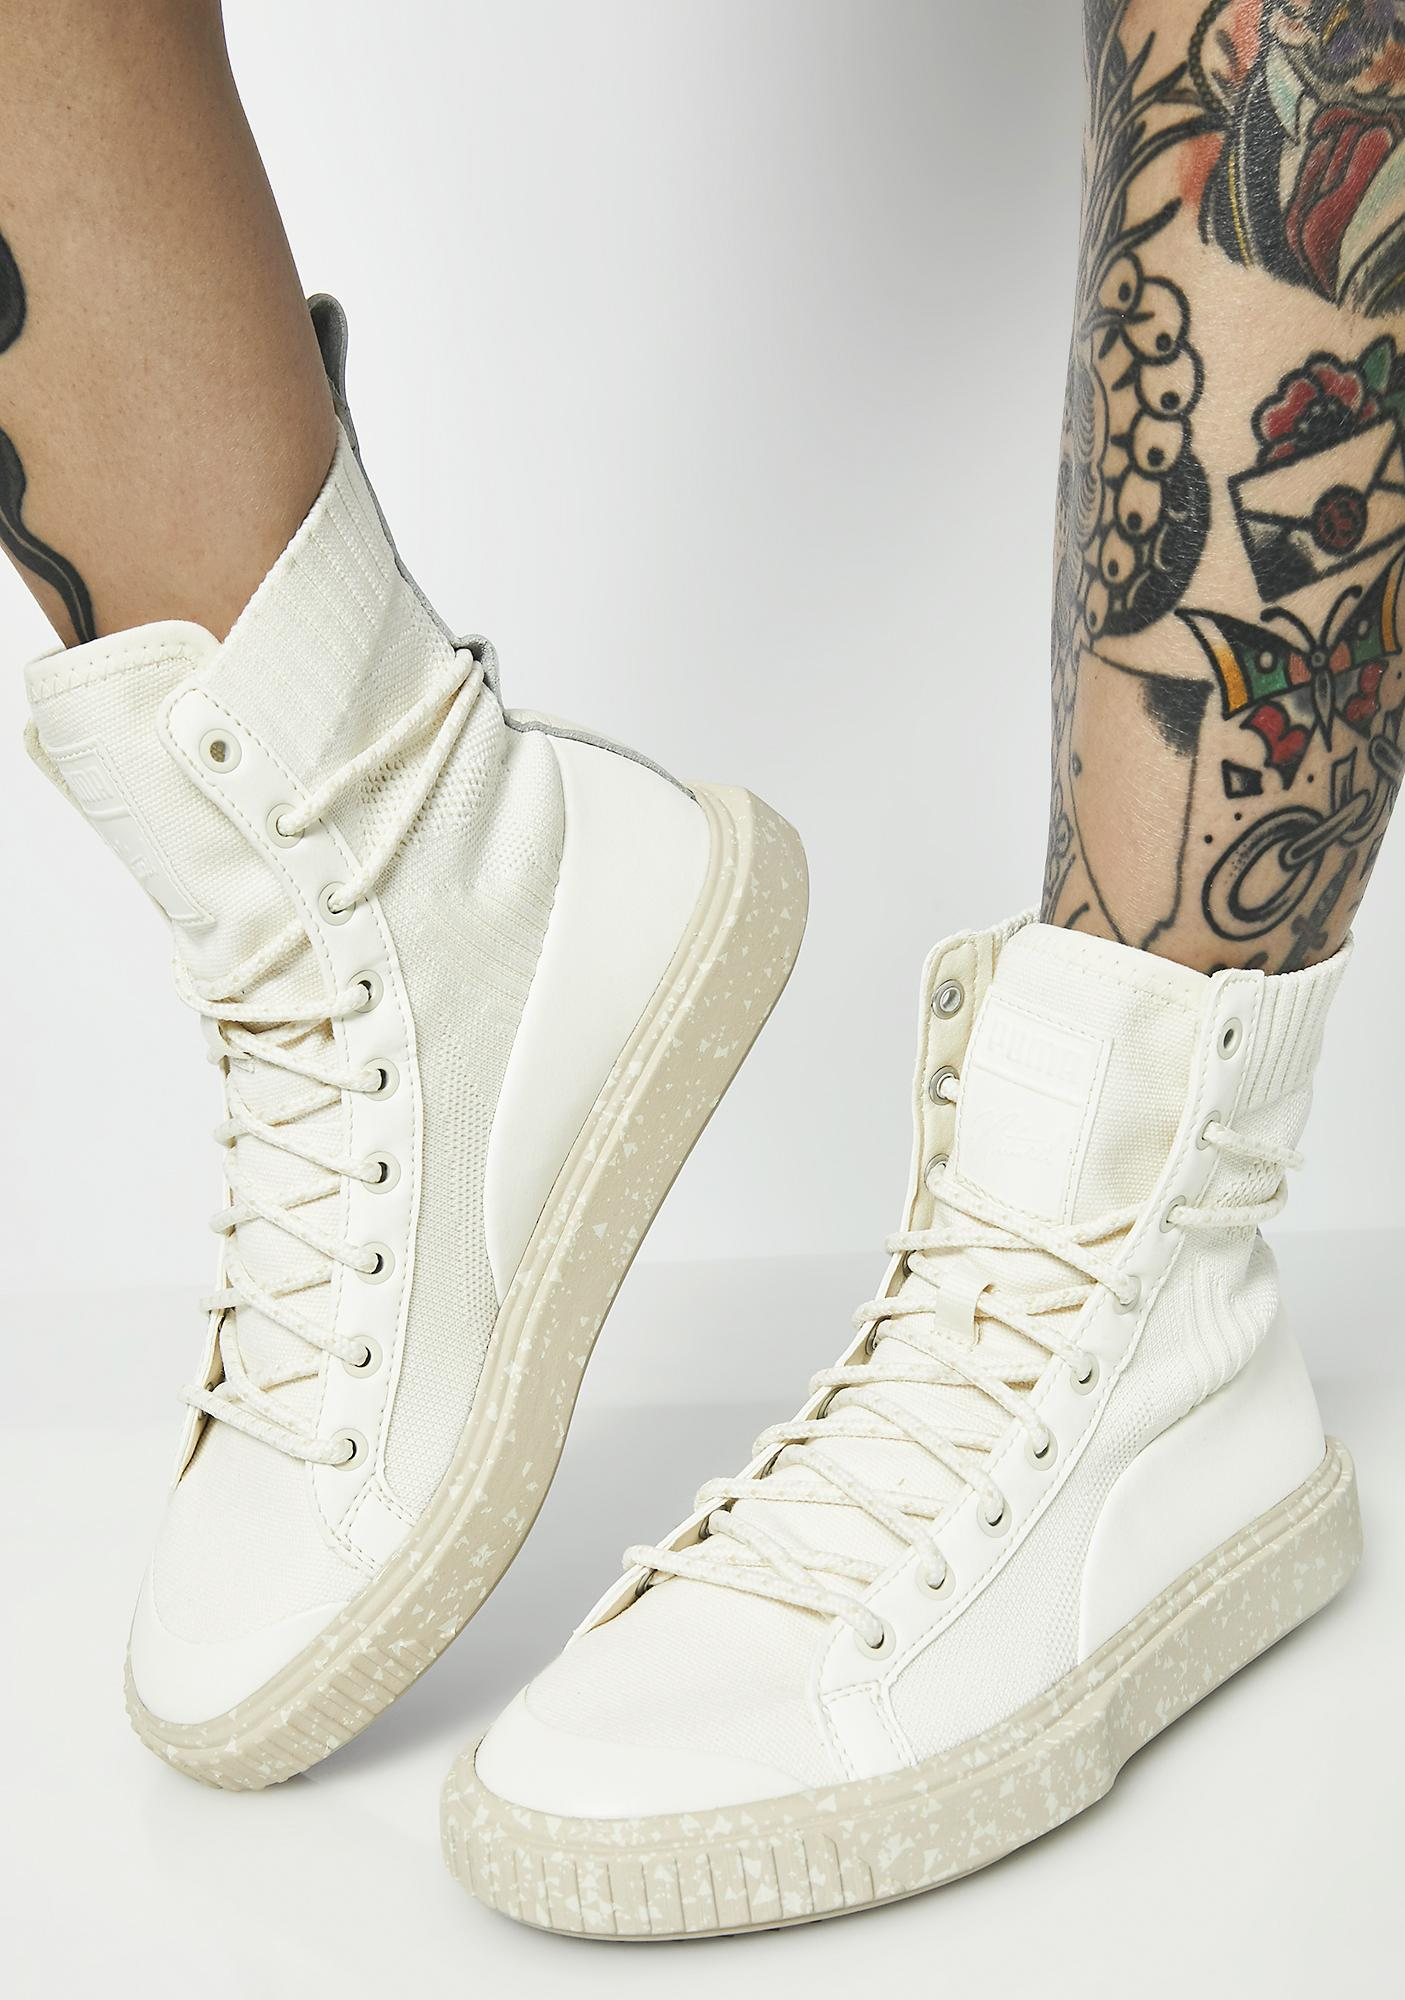 PUMA X Naturel Breaker Sneaker Boots  423ff2046